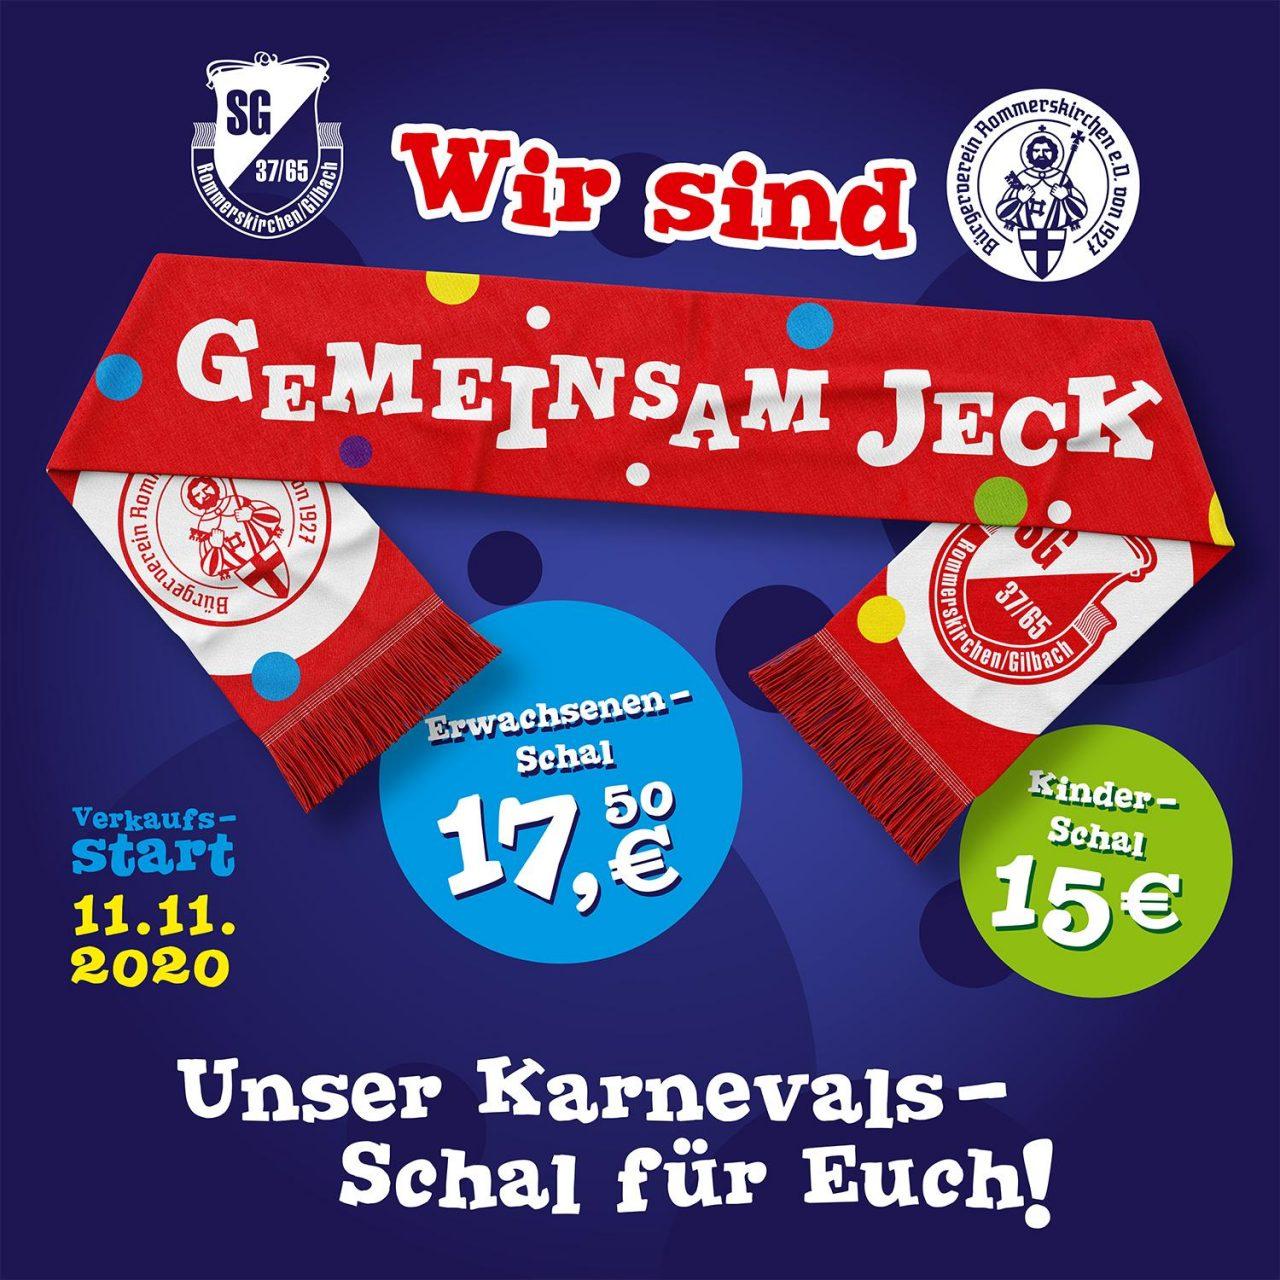 http://rommerskirchen-gilbach.de/wp-content/uploads/2020/11/karneval-1280x1280.jpg